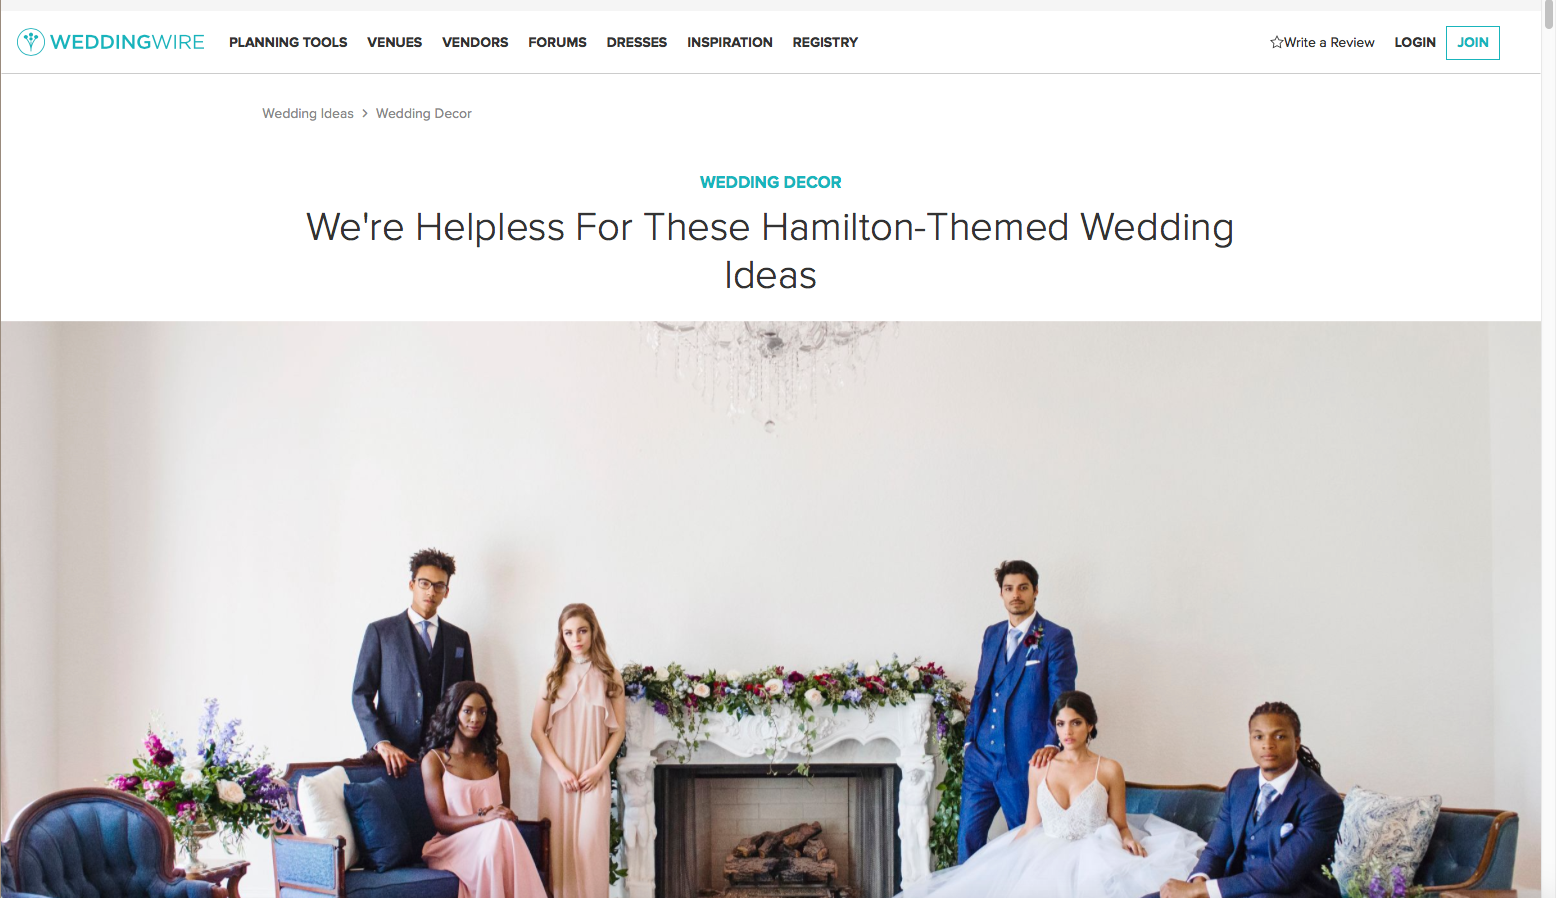 Edera designs featured on WeddingWire